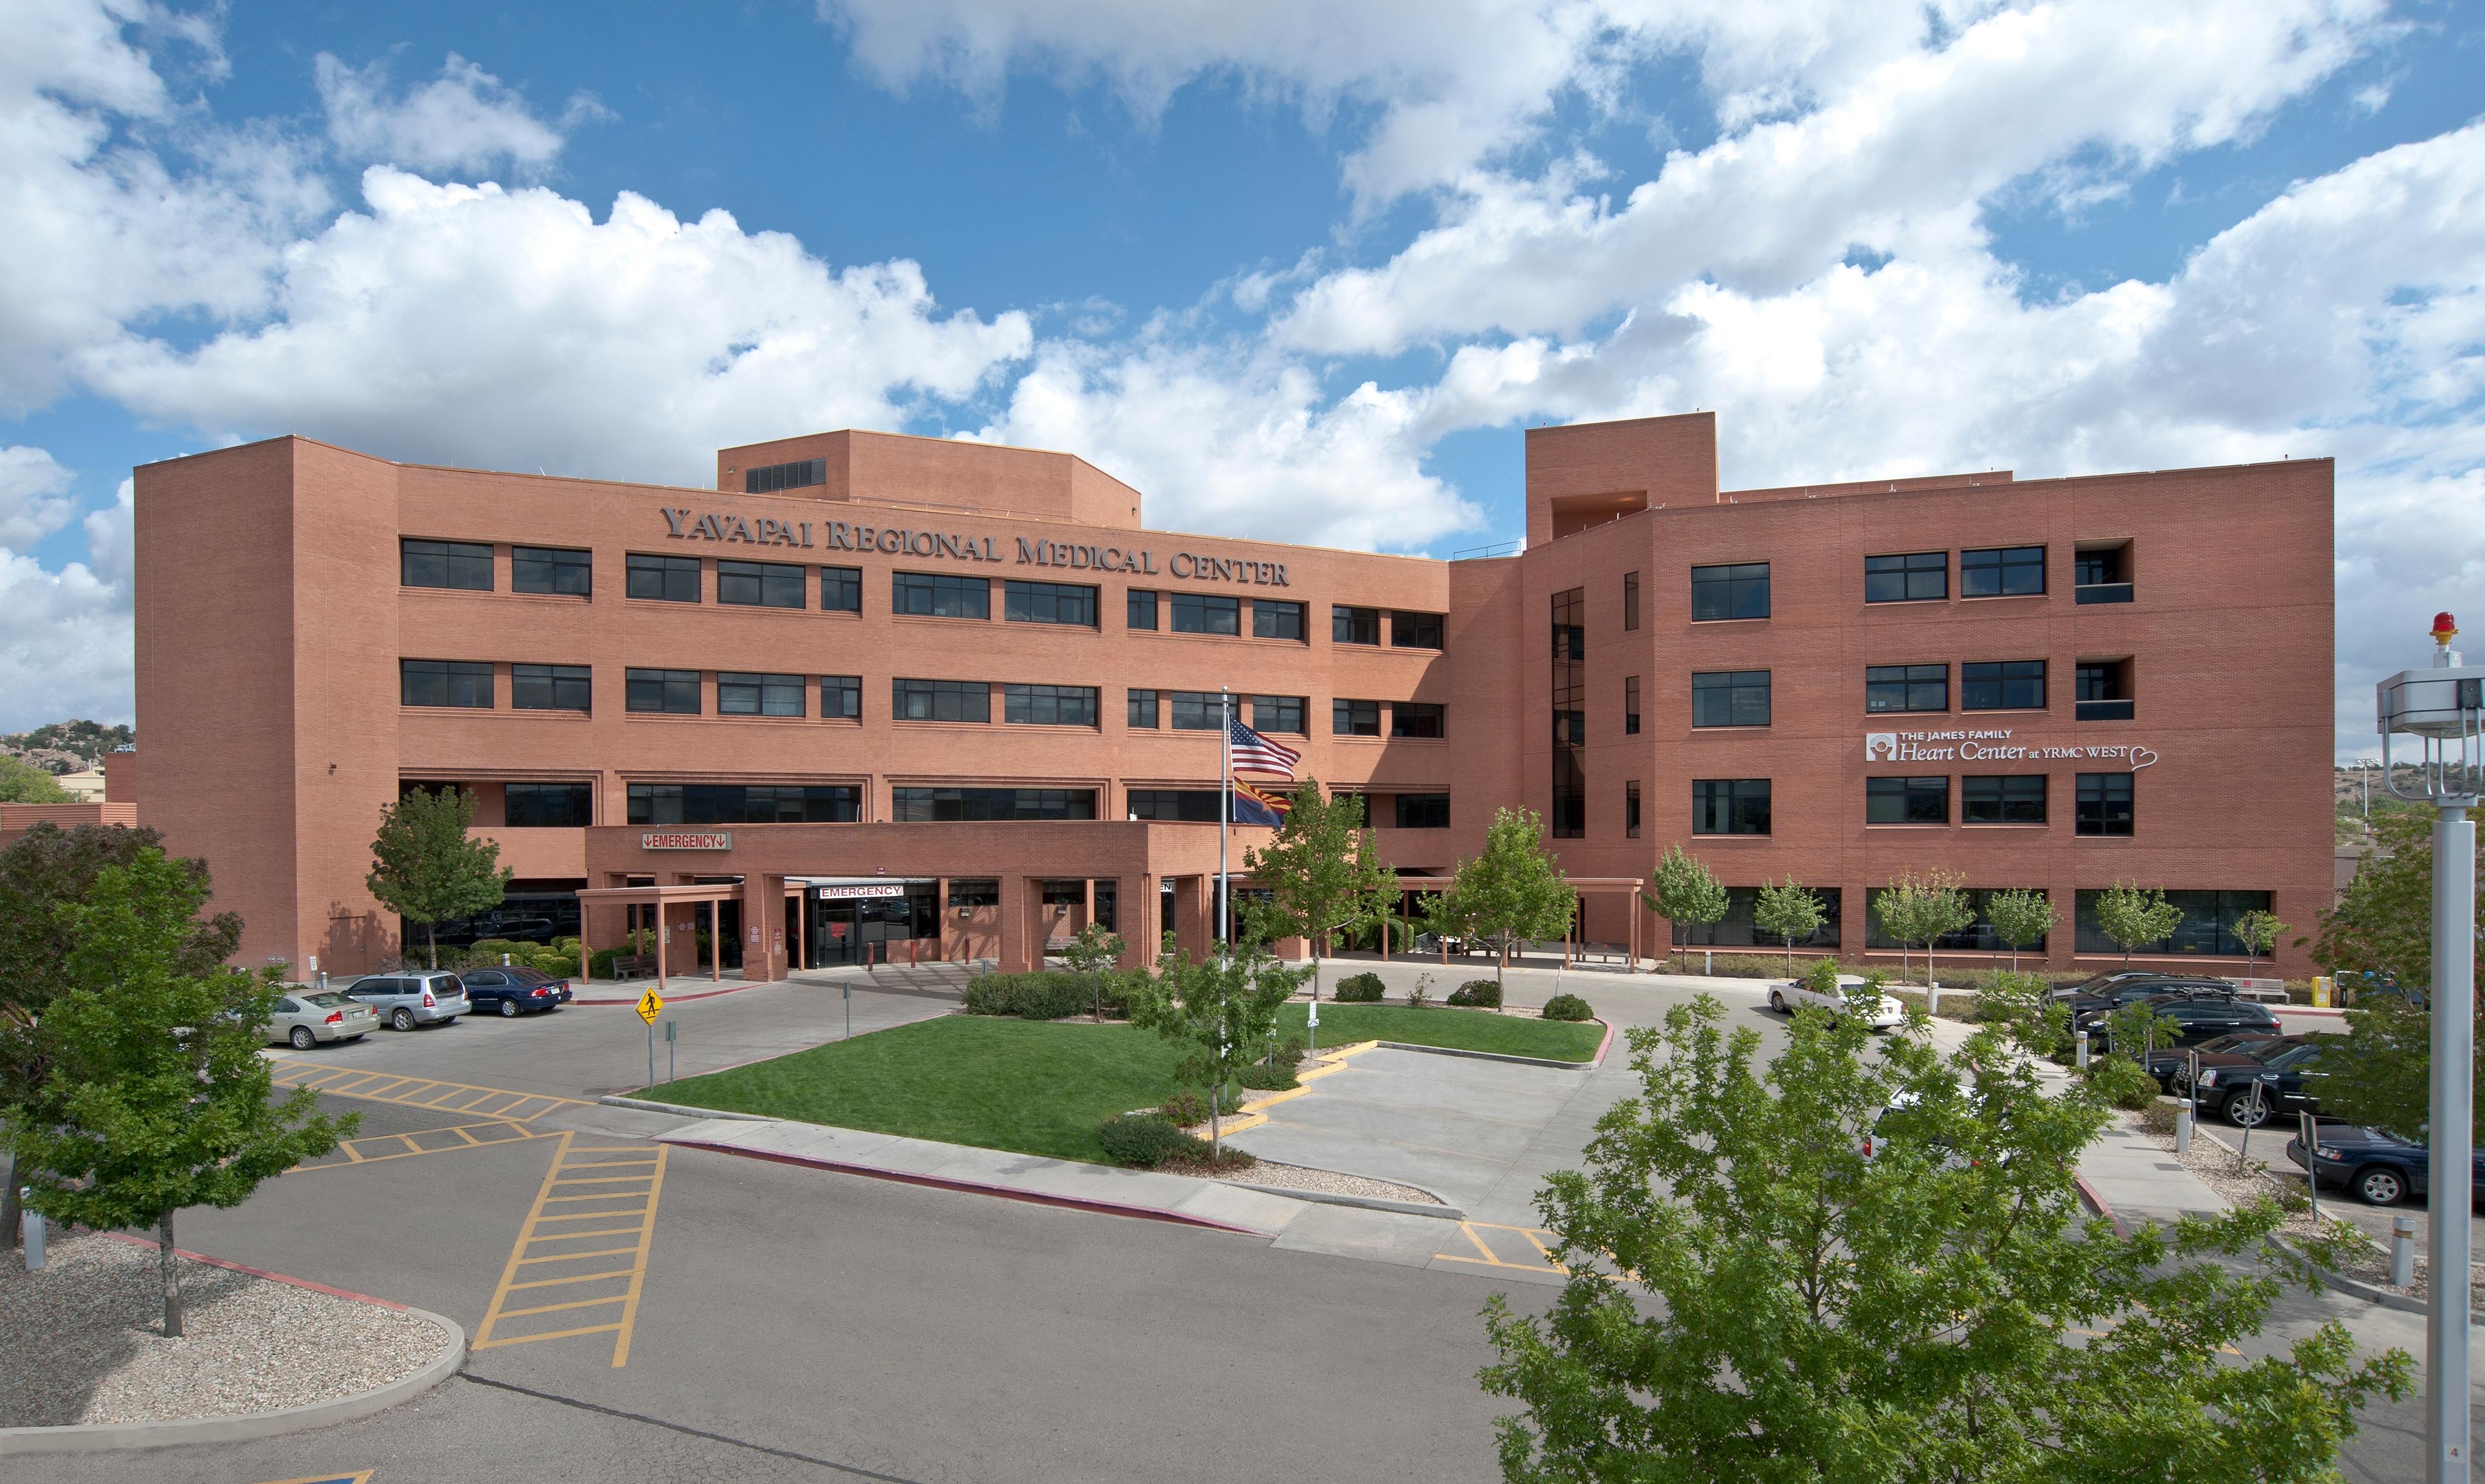 Community Focus: Yavapai Regional Medical Center